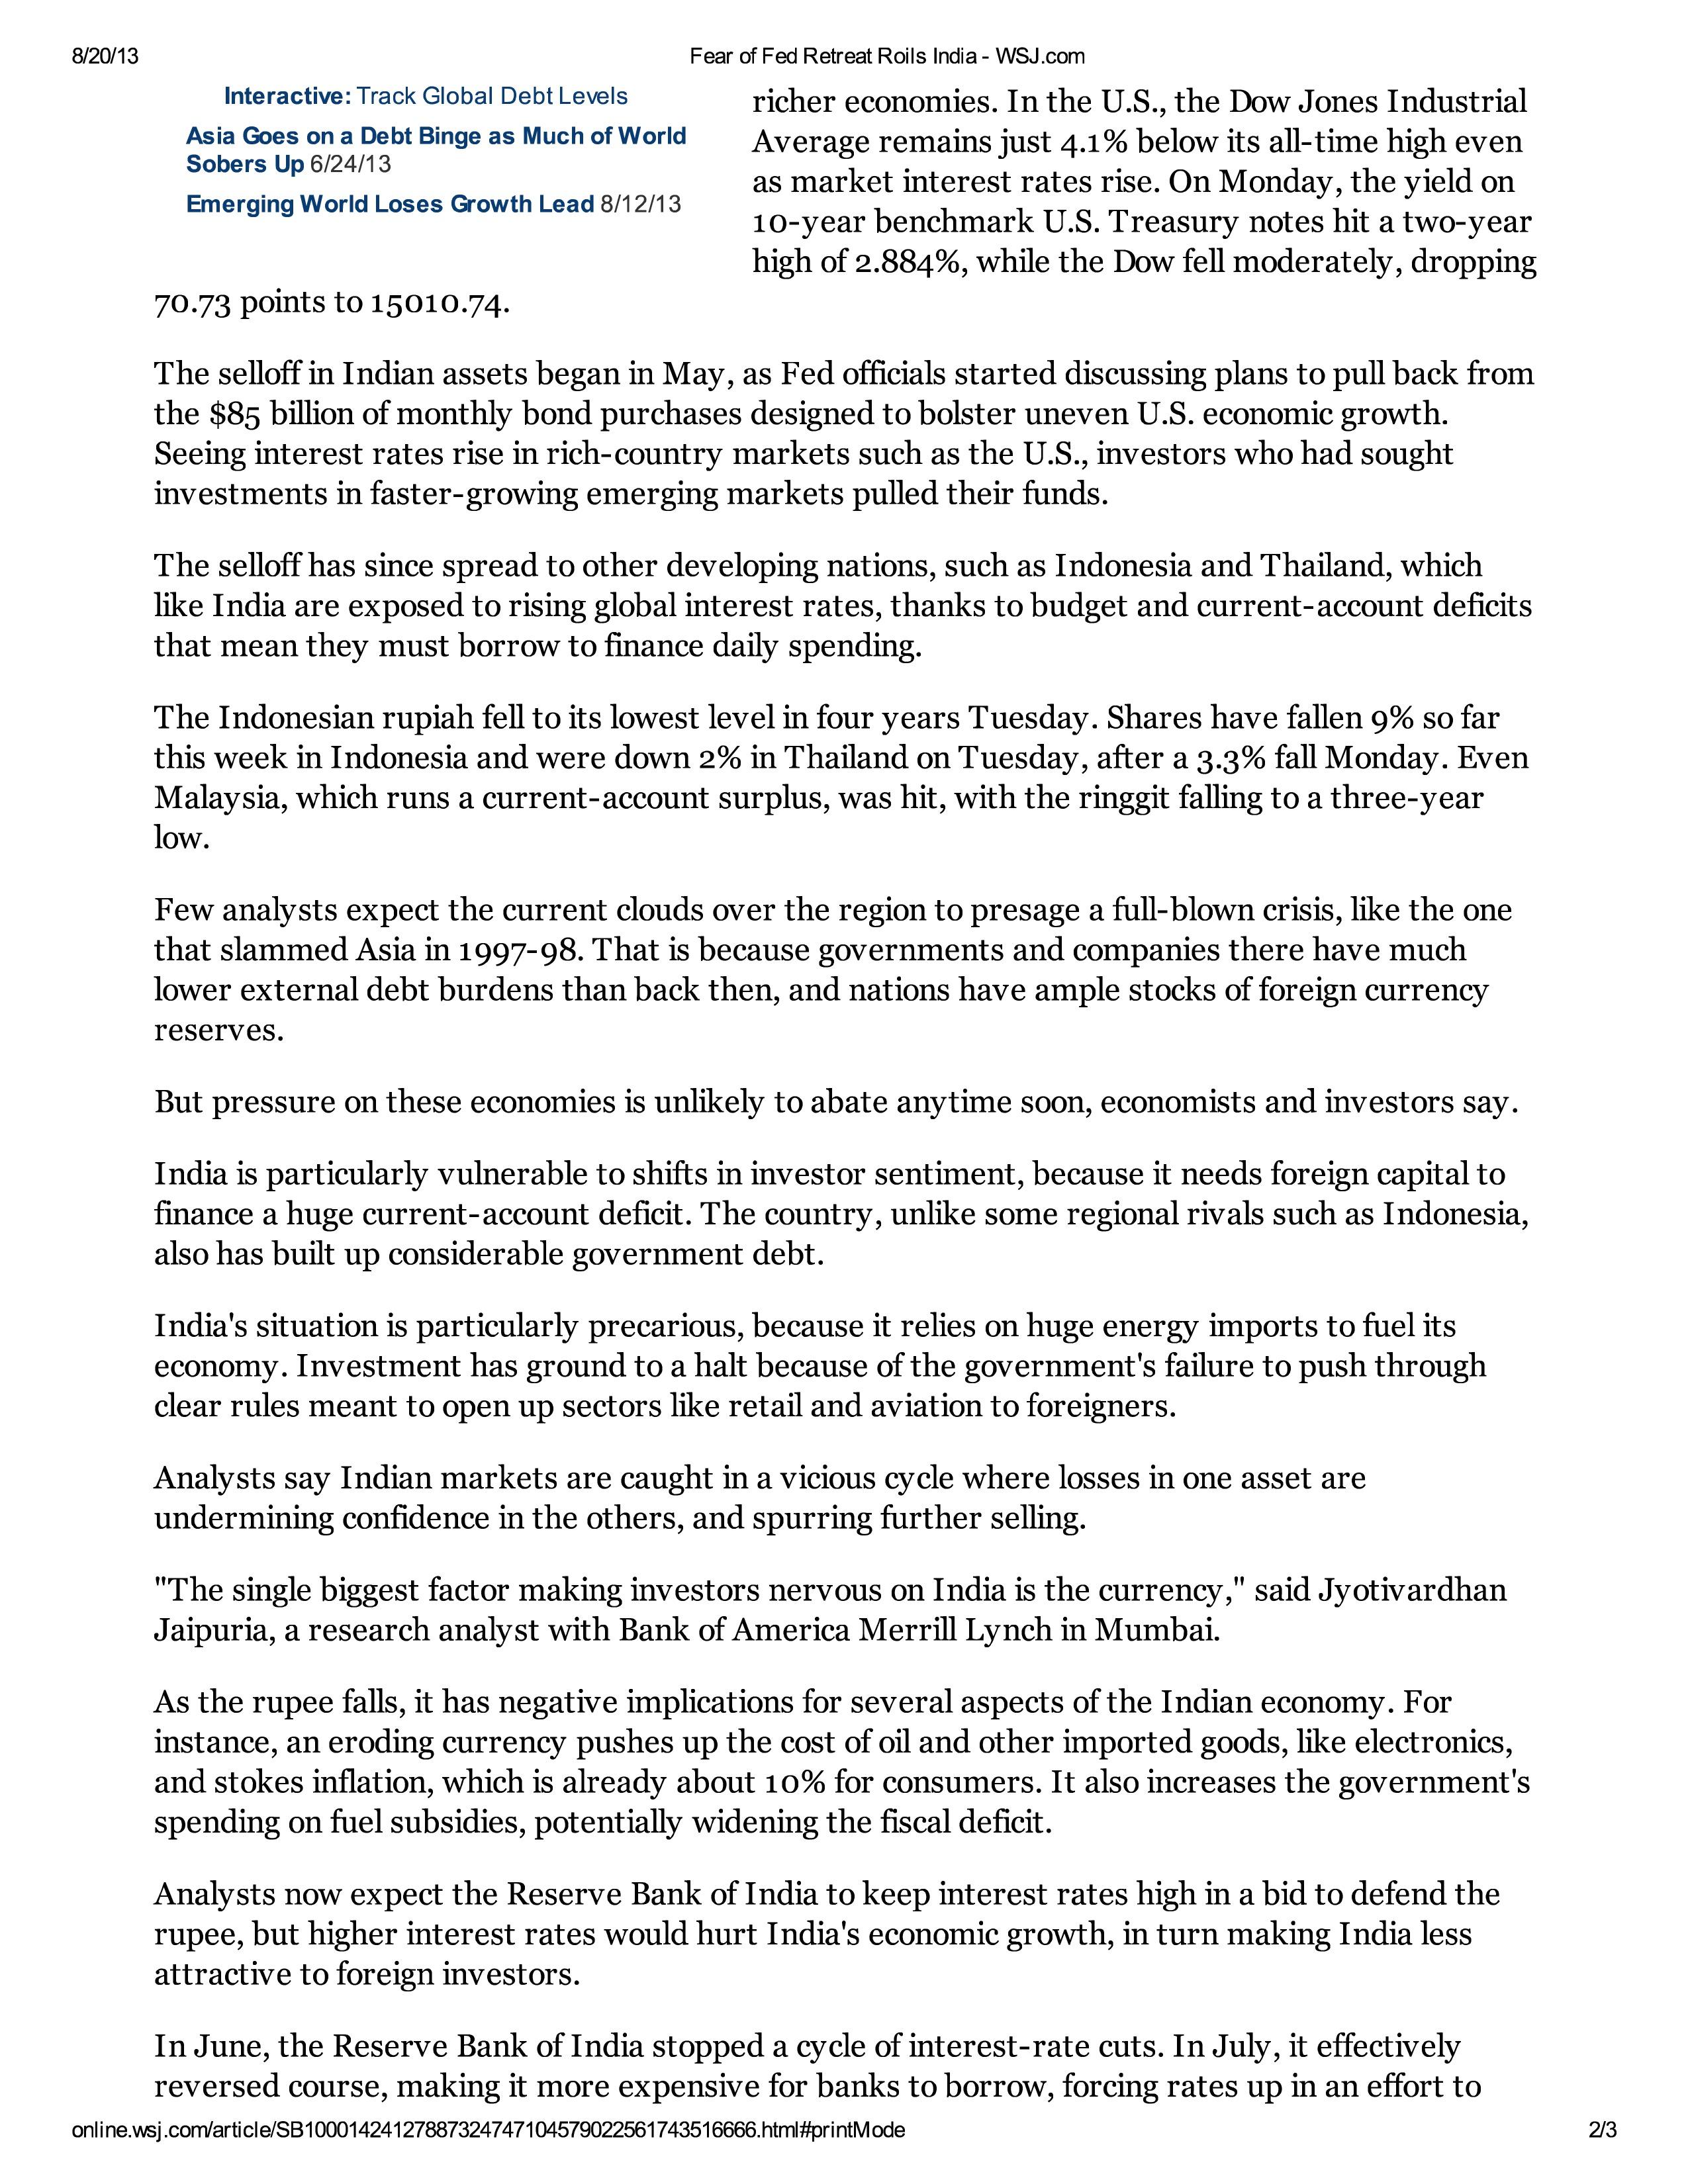 India_economic distress-page-1